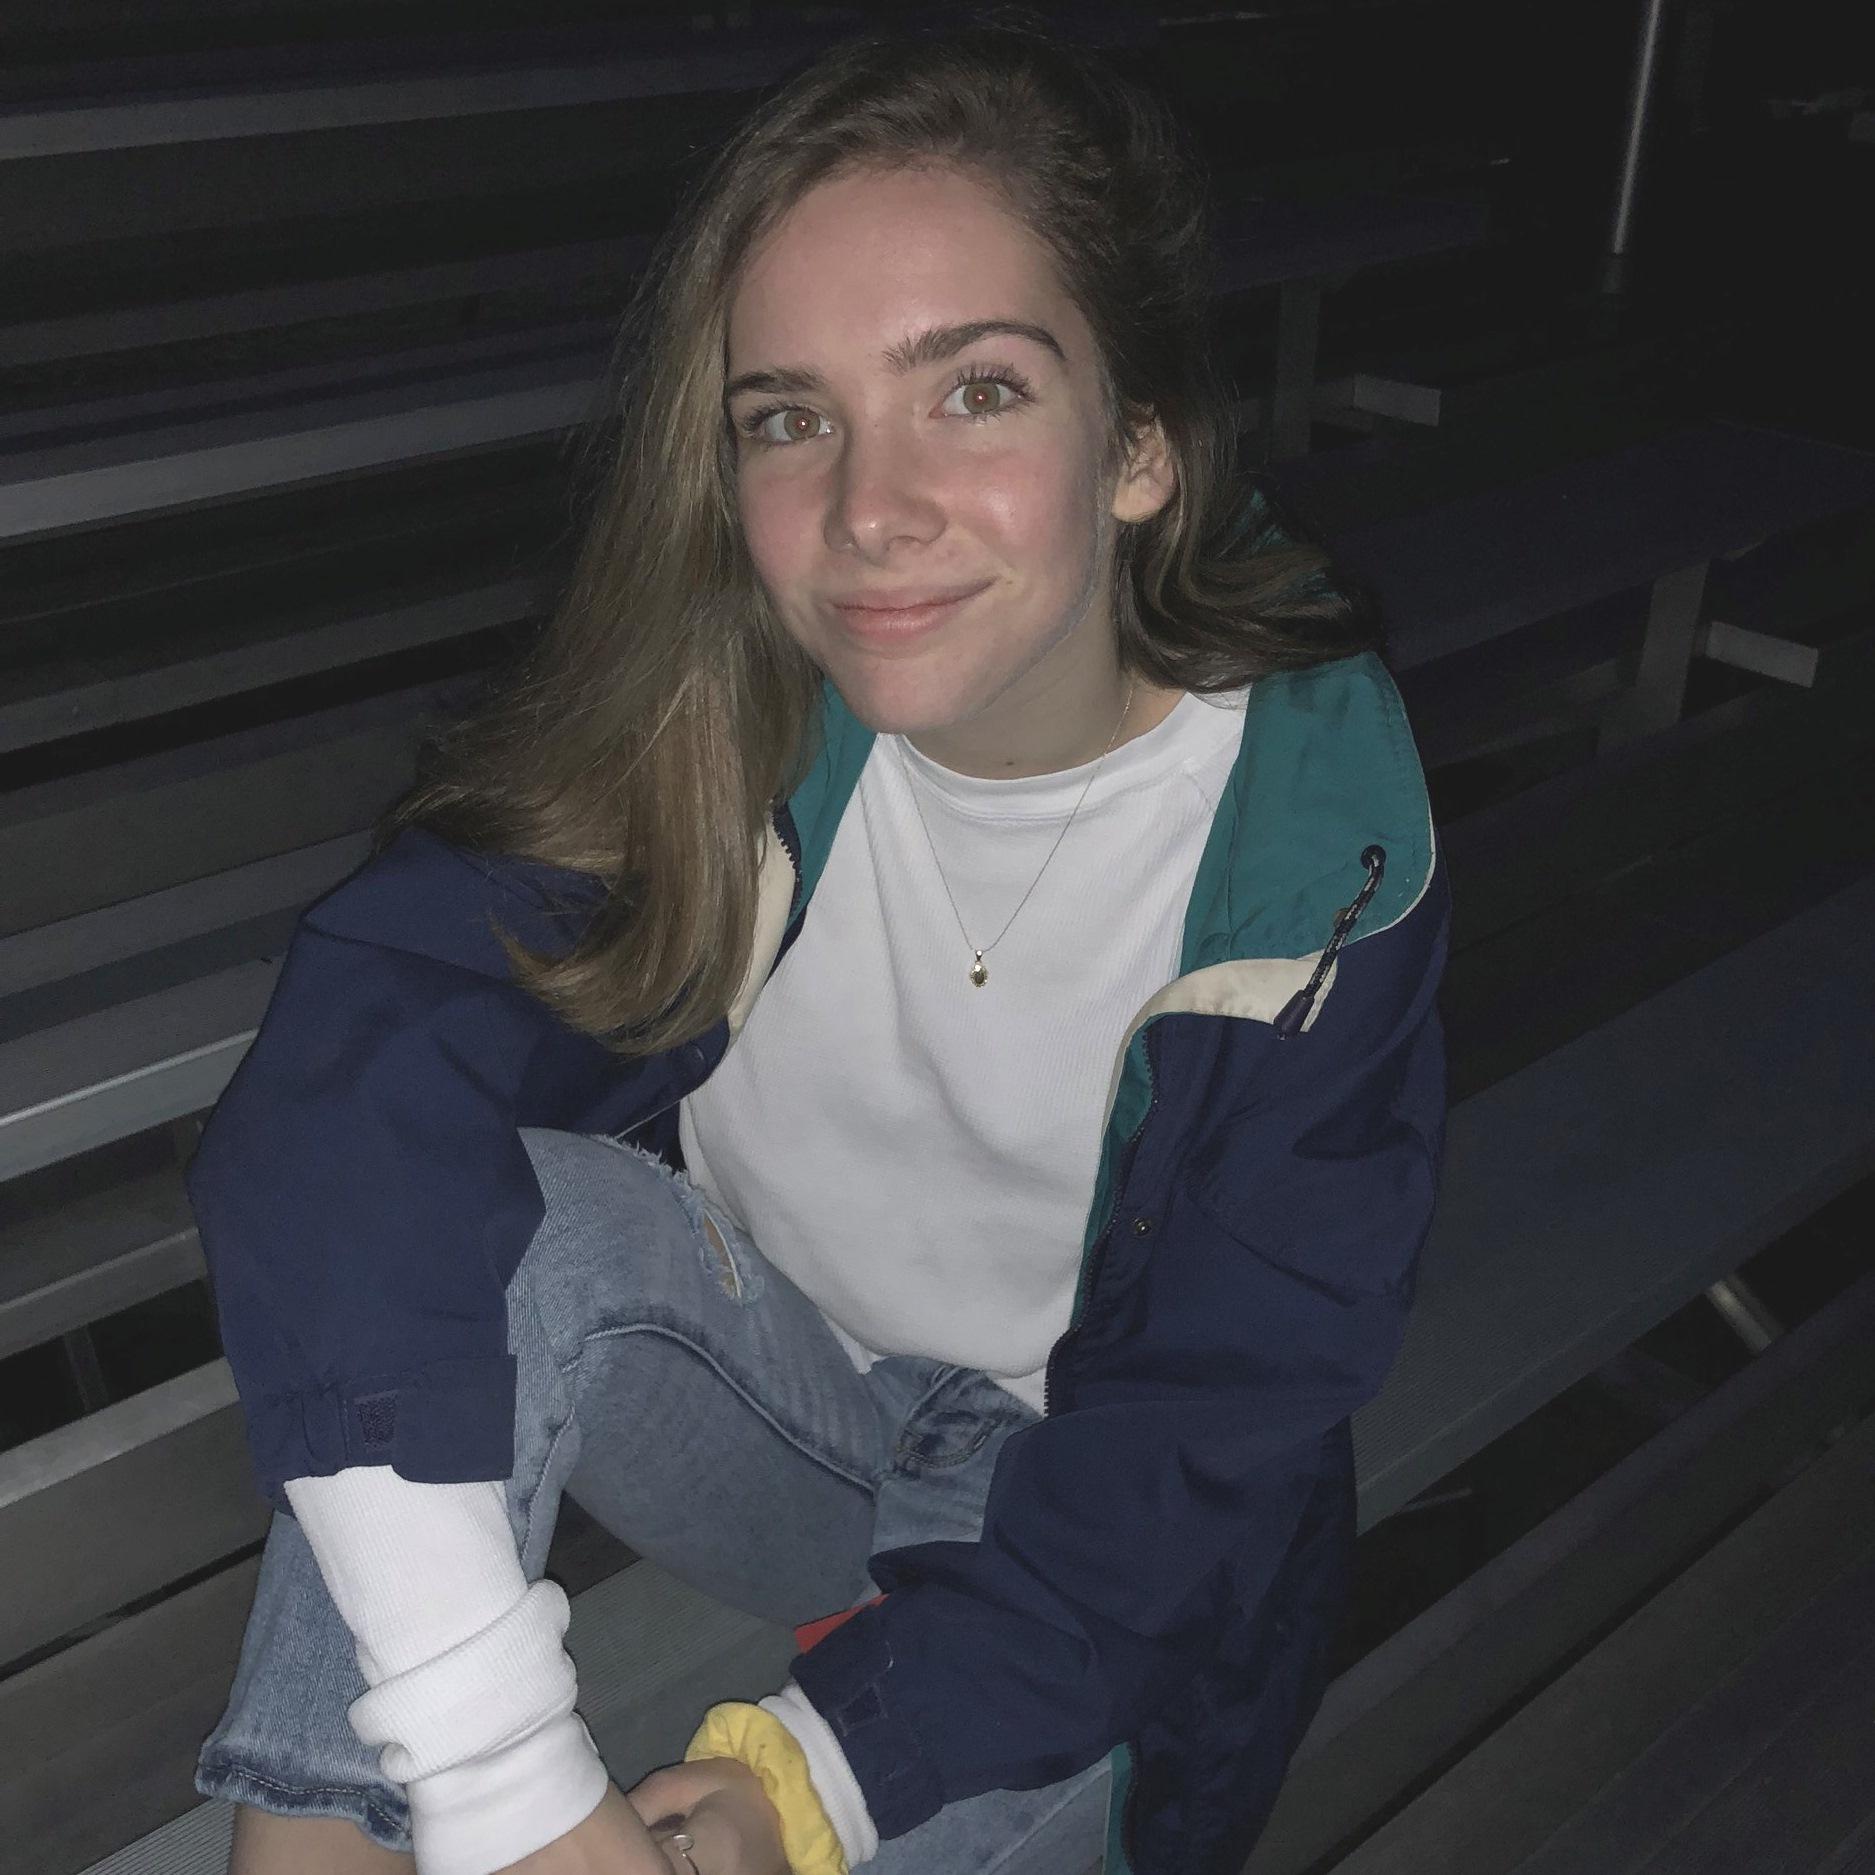 Rachel Goudreau Naumkeag  7 yrs at Camp  Favorite Camp Memory: My favorite camp memory is probably my tribe initiation as a naumkeag.